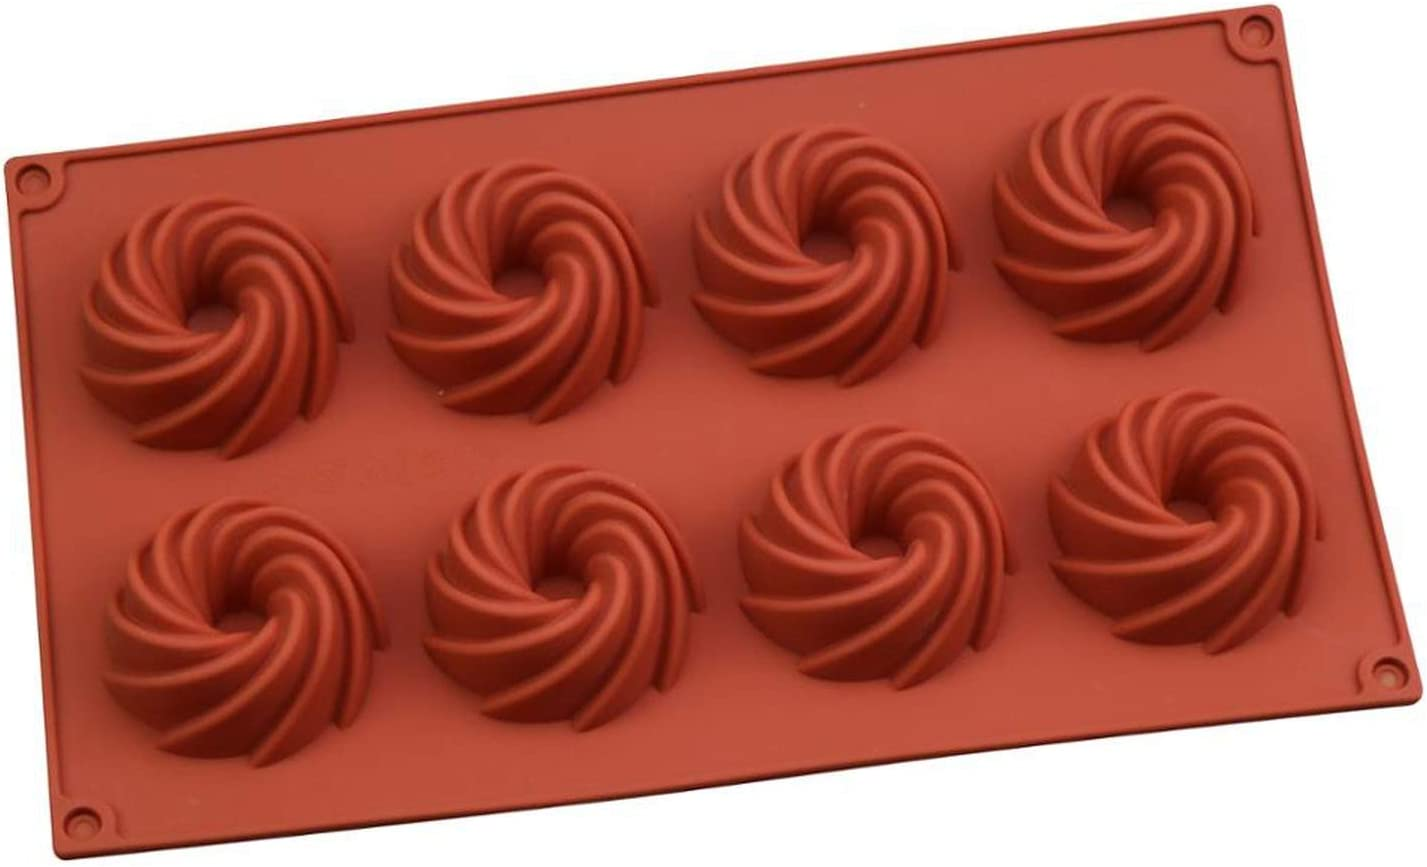 Magdalenas Moldes Corona dona silicón moldea hornada de la torta de chocolate Herramientas Herramientas de azúcar que adorna caramelo Muffin molde de repostería para hornear sartenes, 8 Spril Donut,: Amazon.es: Hogar